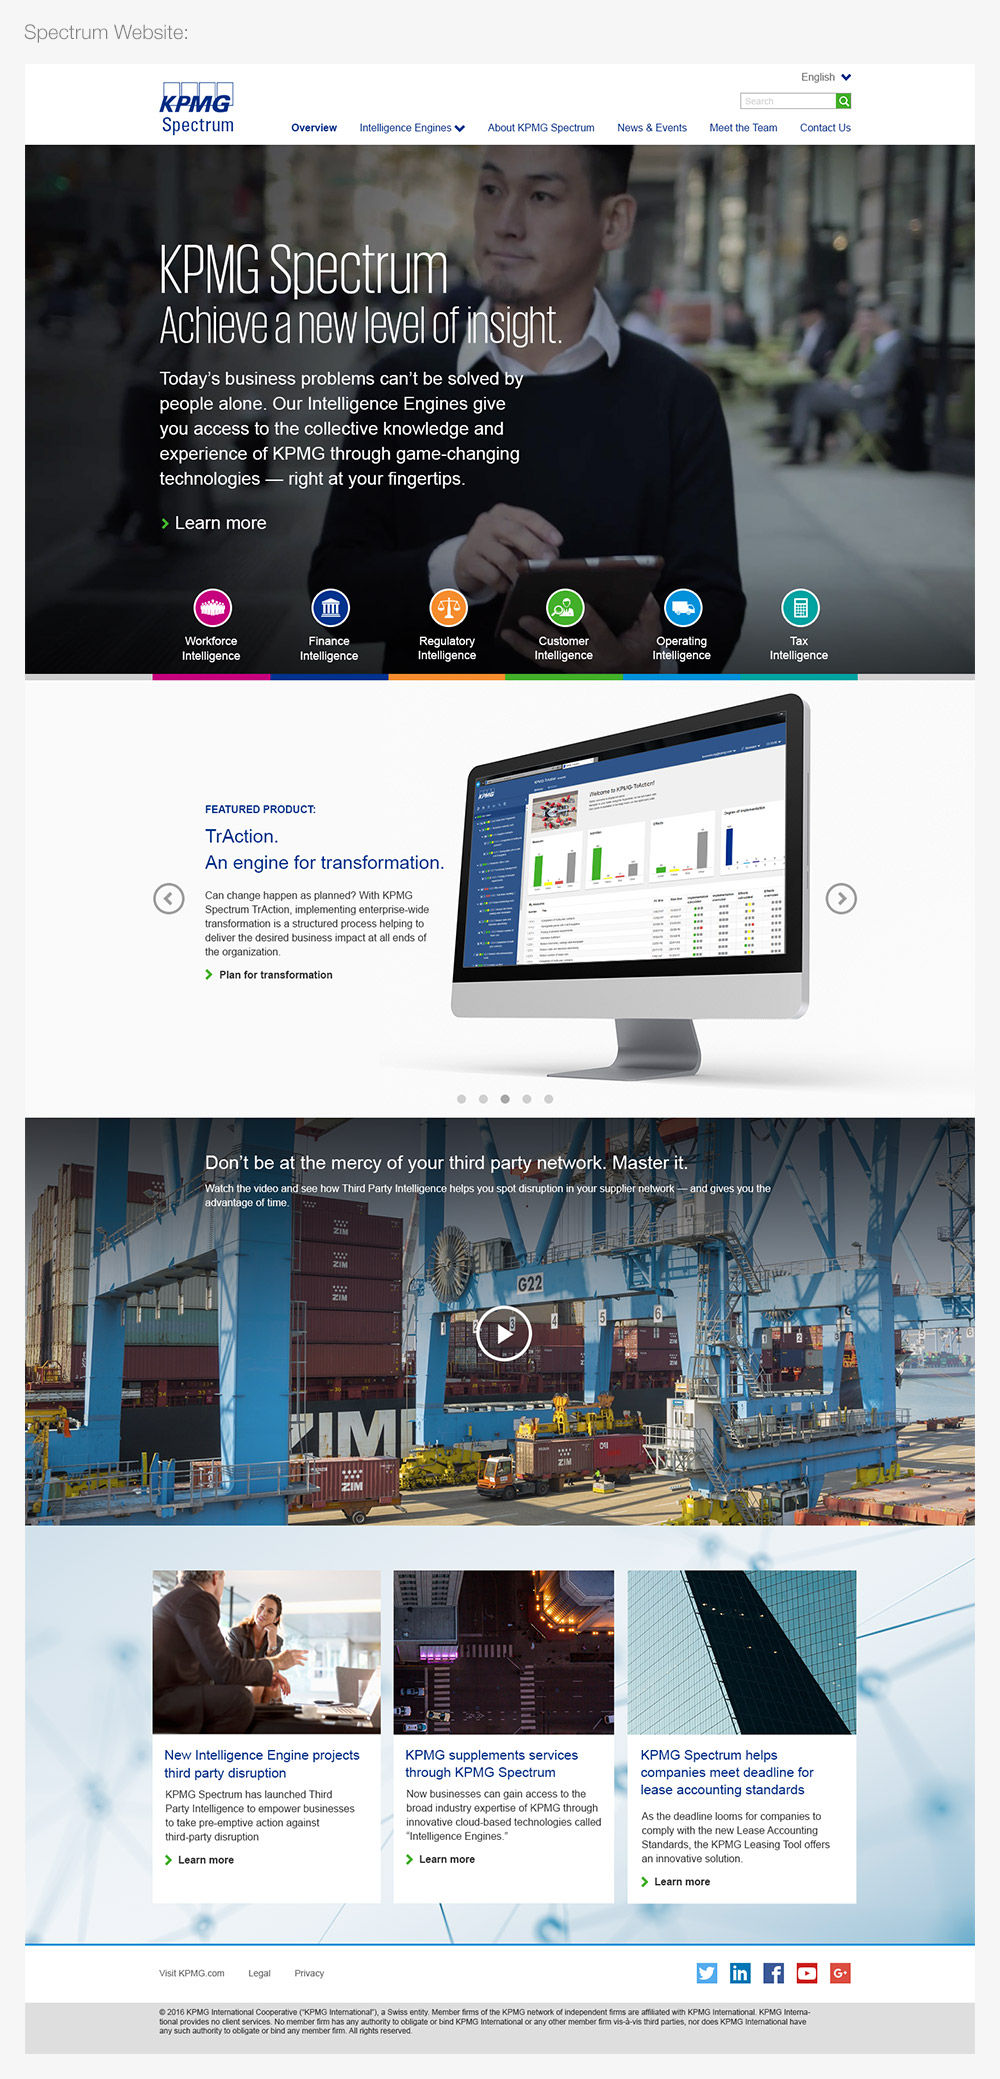 kpmg-spectrum-website